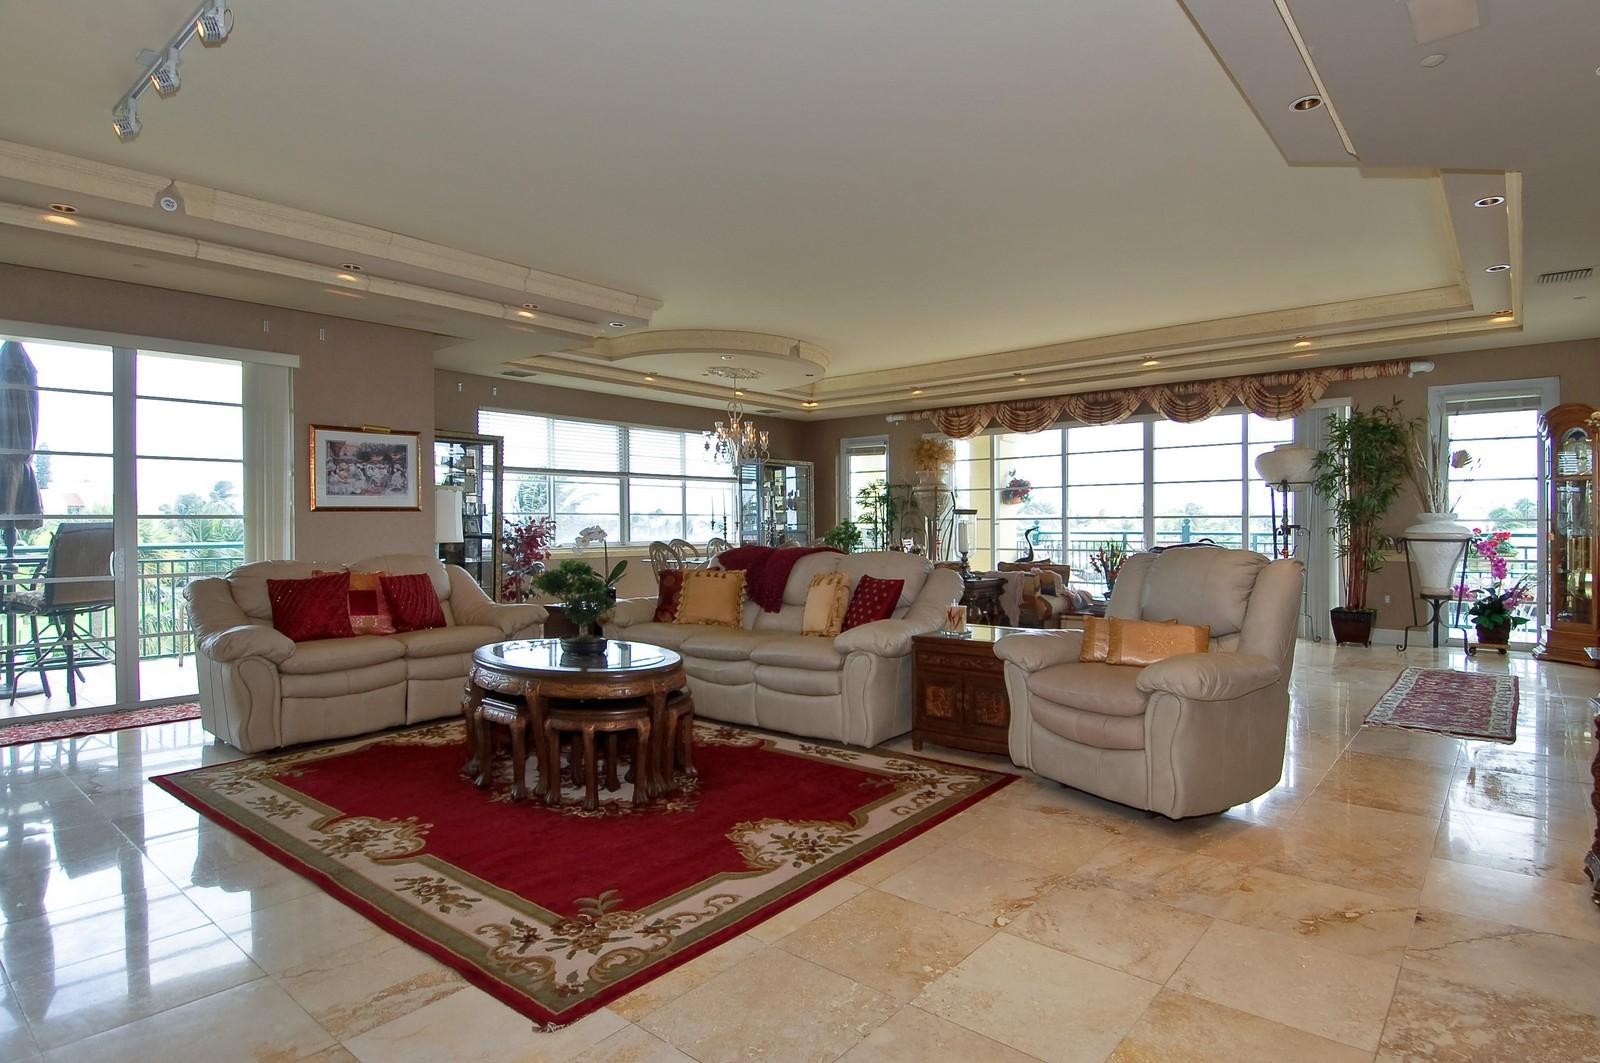 Real Estate Photography - 1230 Hillsboro Mile, Hillsboro Beach, FL, 33062 - Living Room / Dining Room